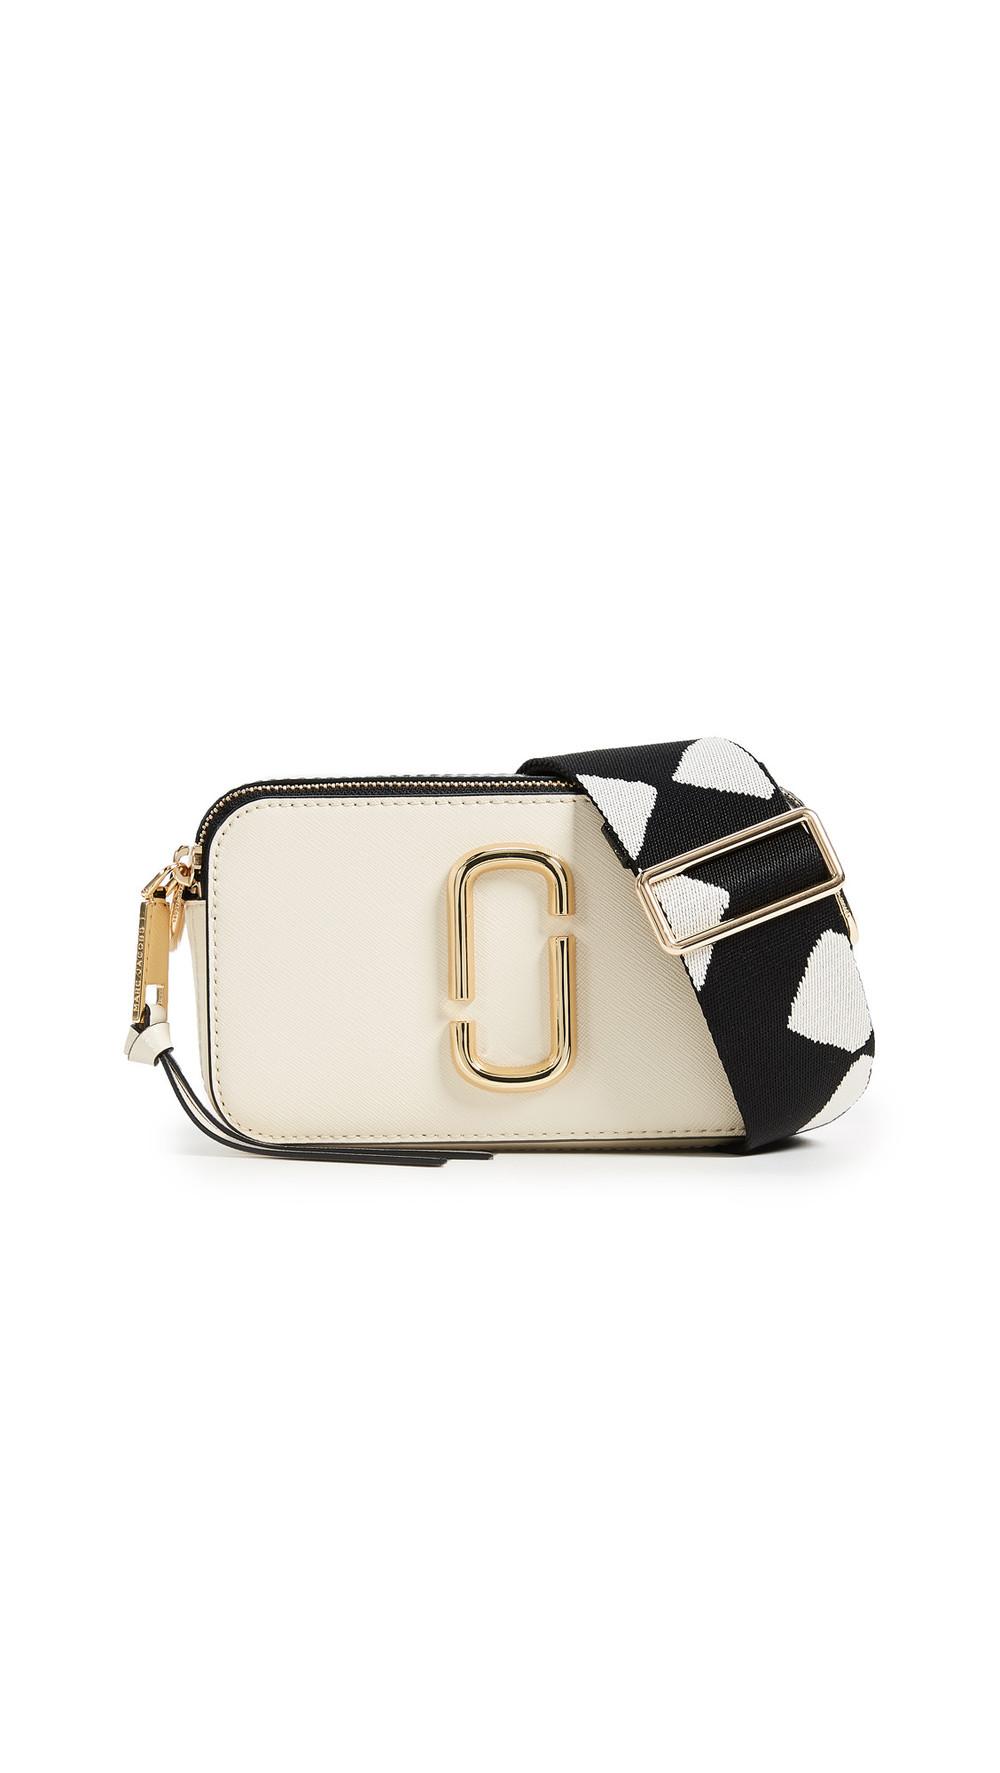 Marc Jacobs Snapshot Camera Bag in white / multi